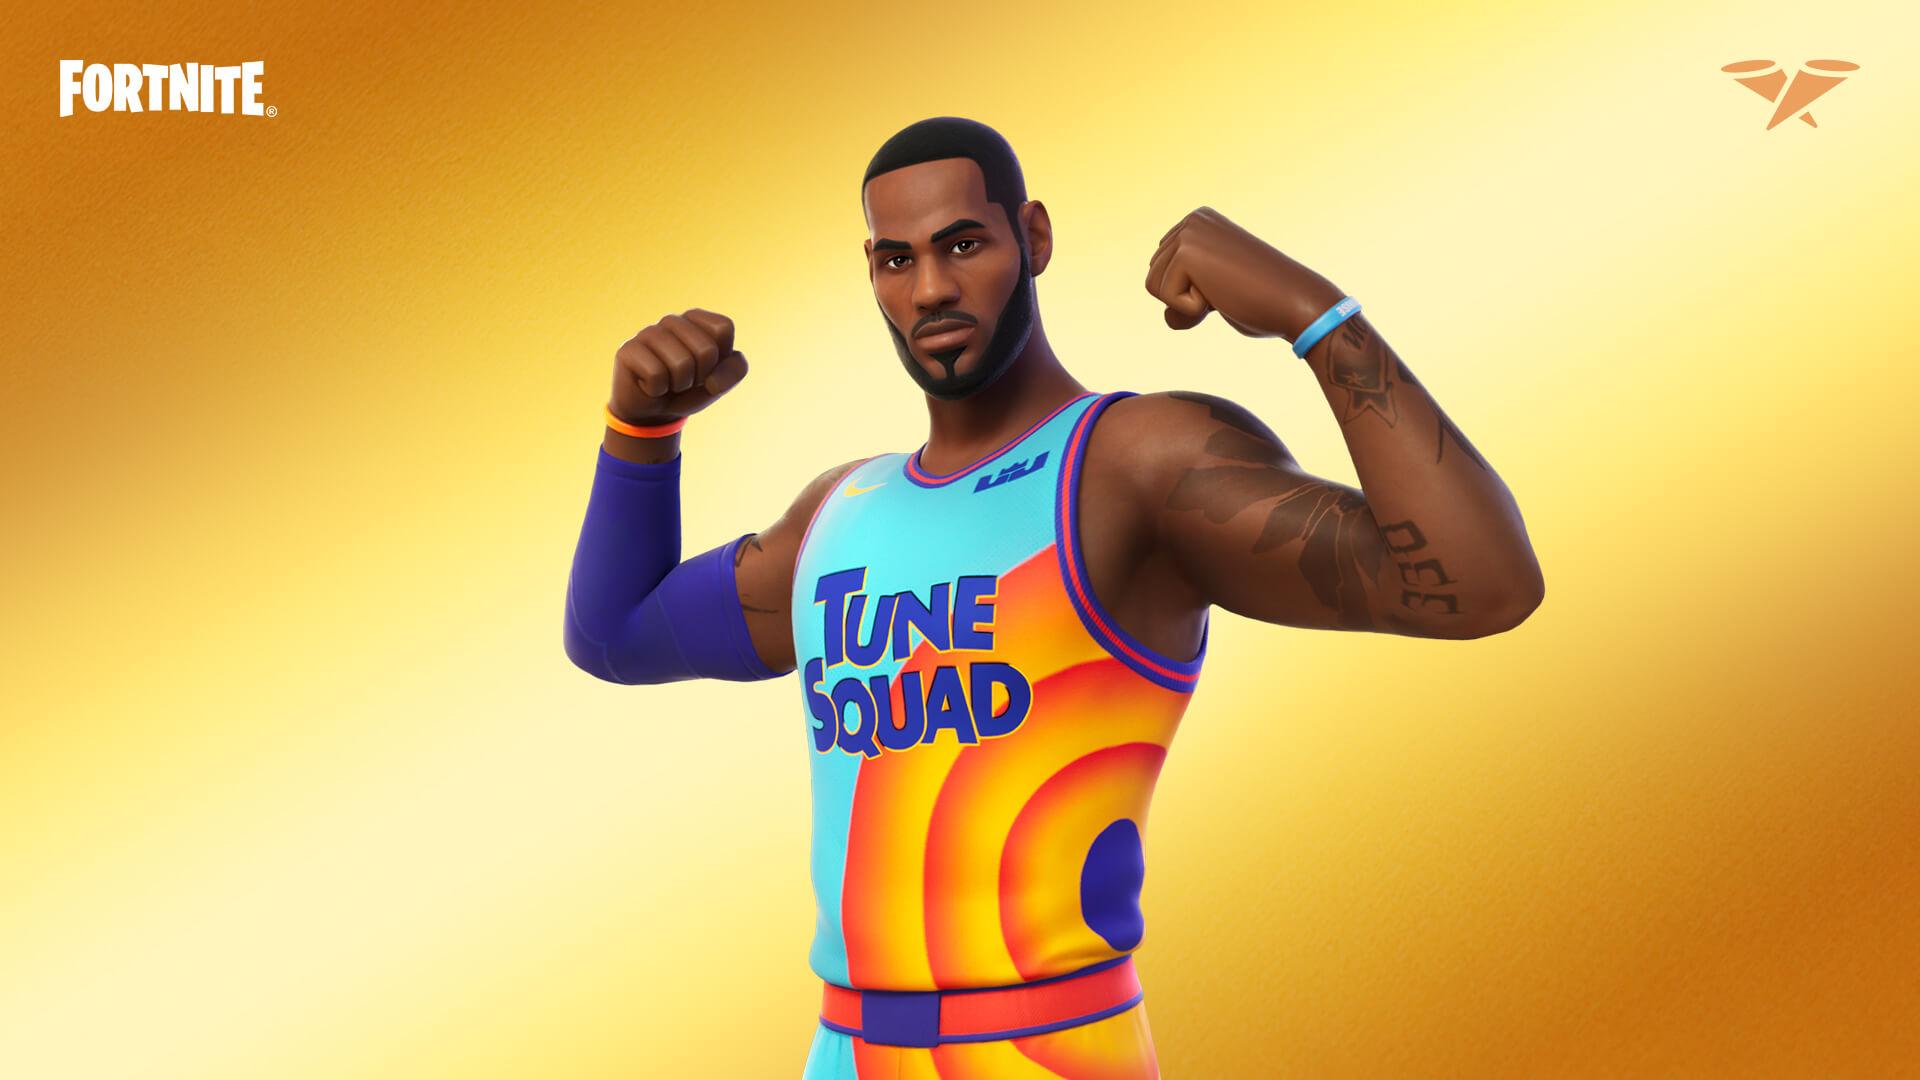 Fortnite Lebron James Tune Squad Outfit